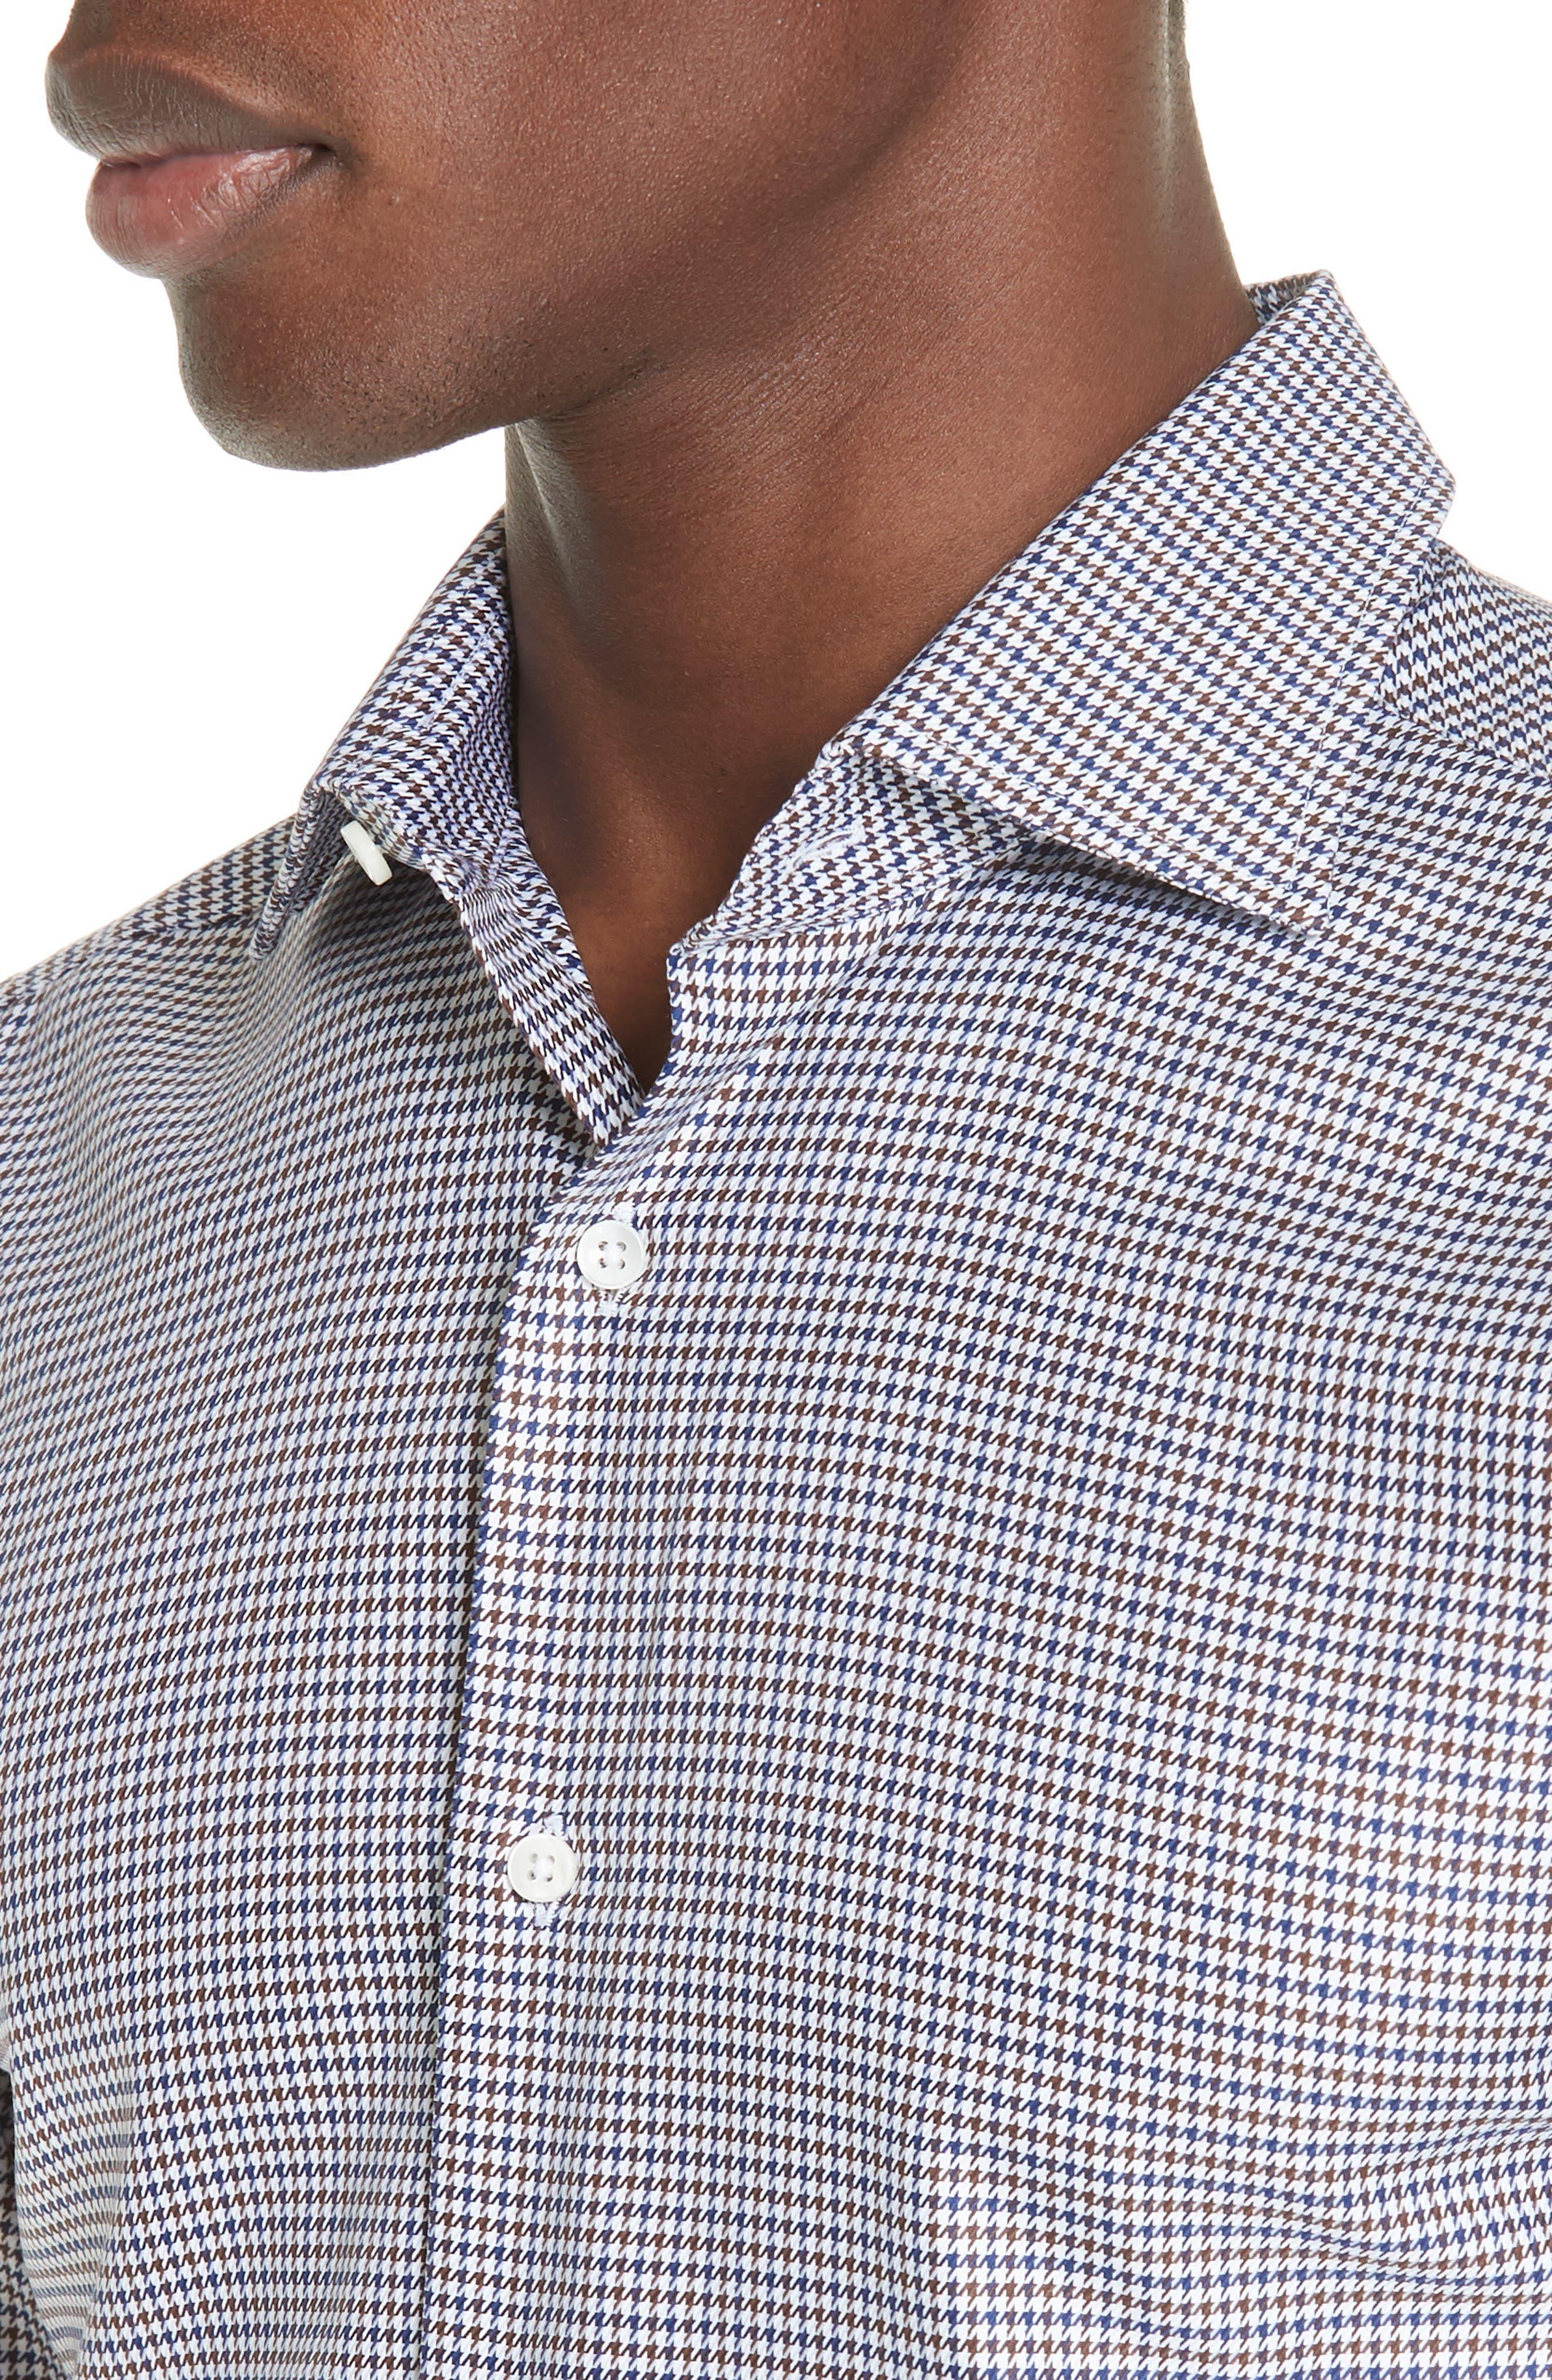 Regular Fit Houndstooth Dress Shirt,                             Alternate thumbnail 2, color,                             NAVY/ BROWN